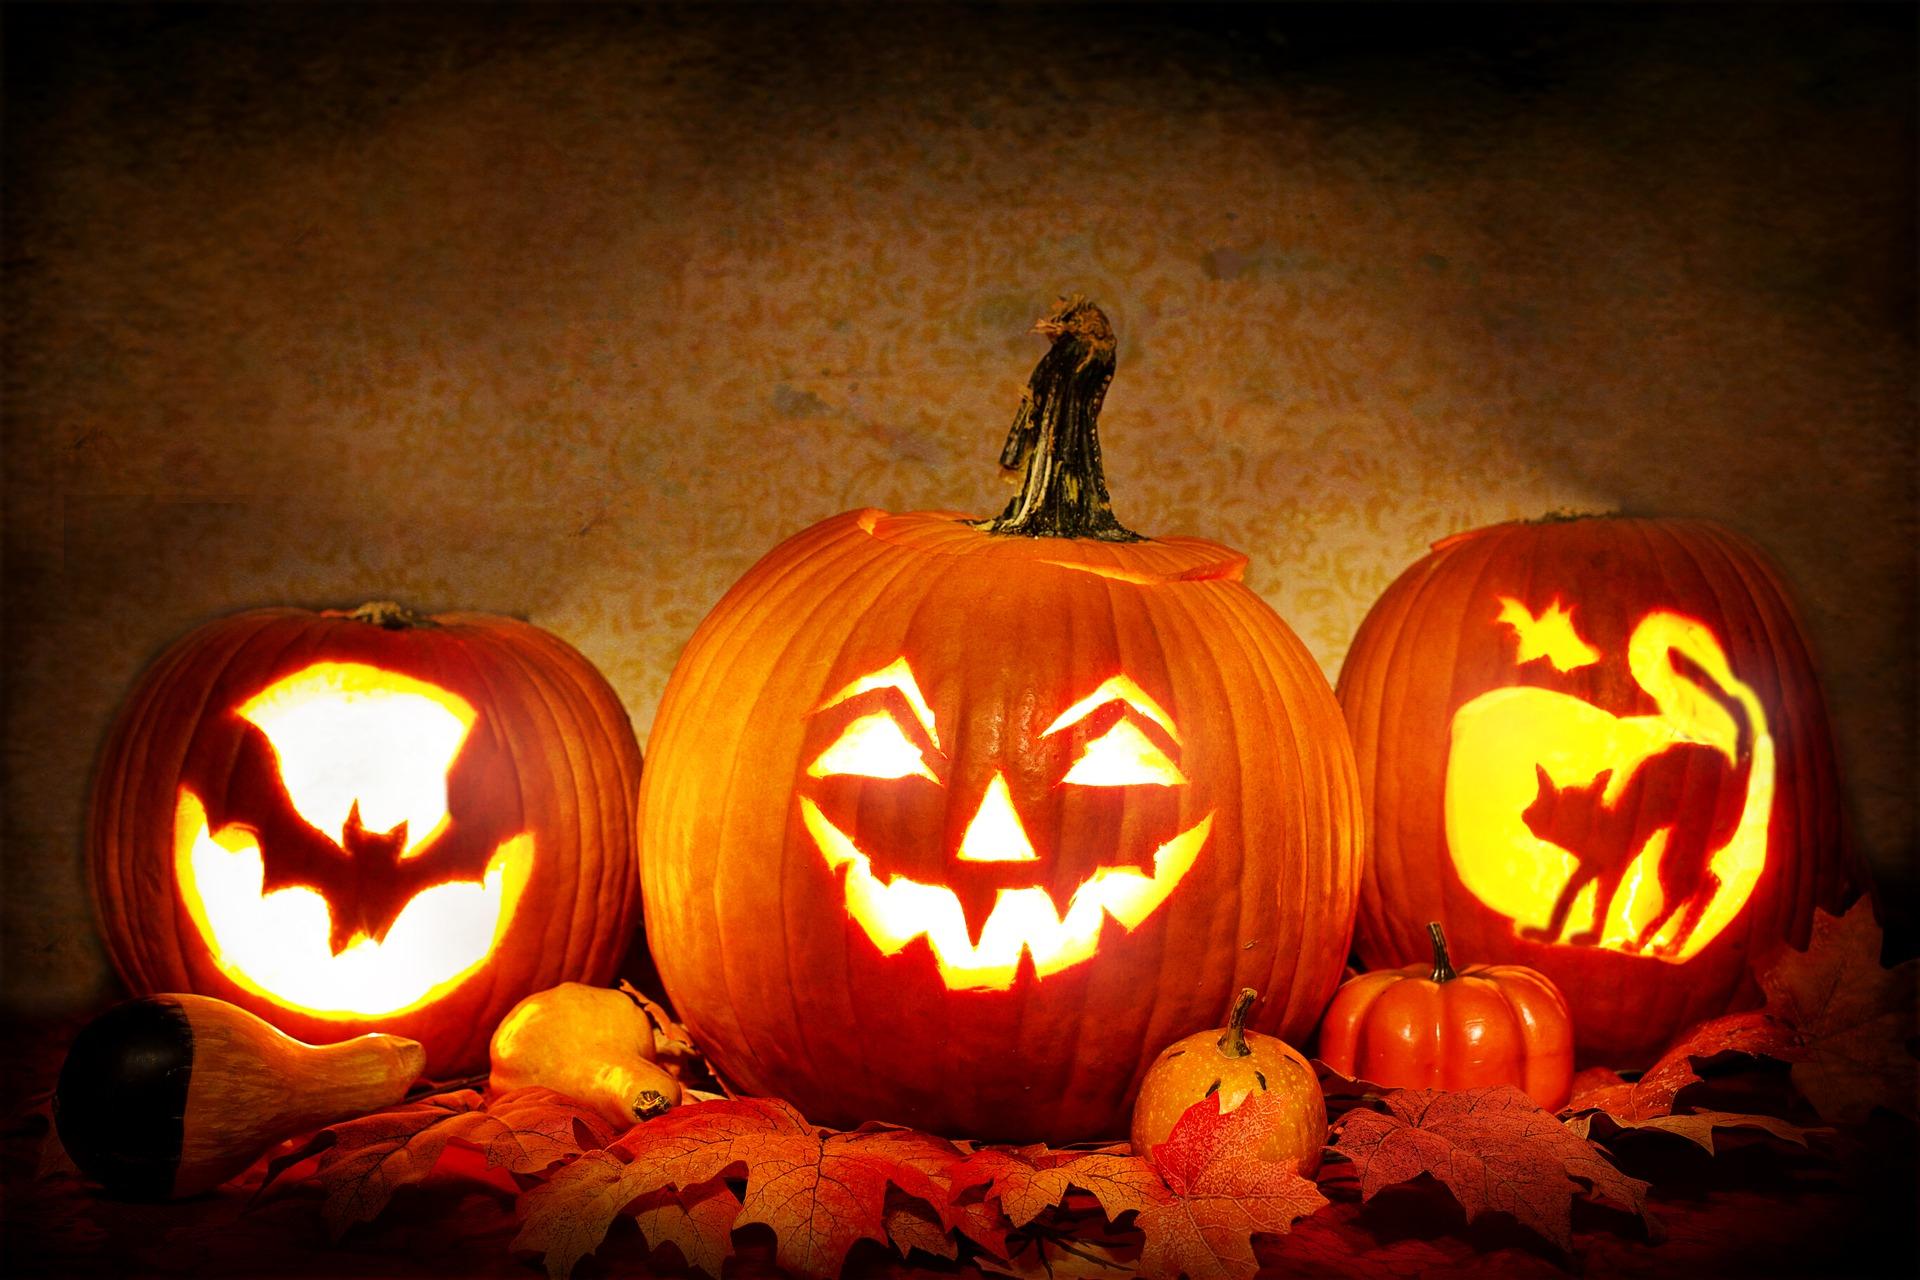 Kürbis - pumpkin (Halloween)